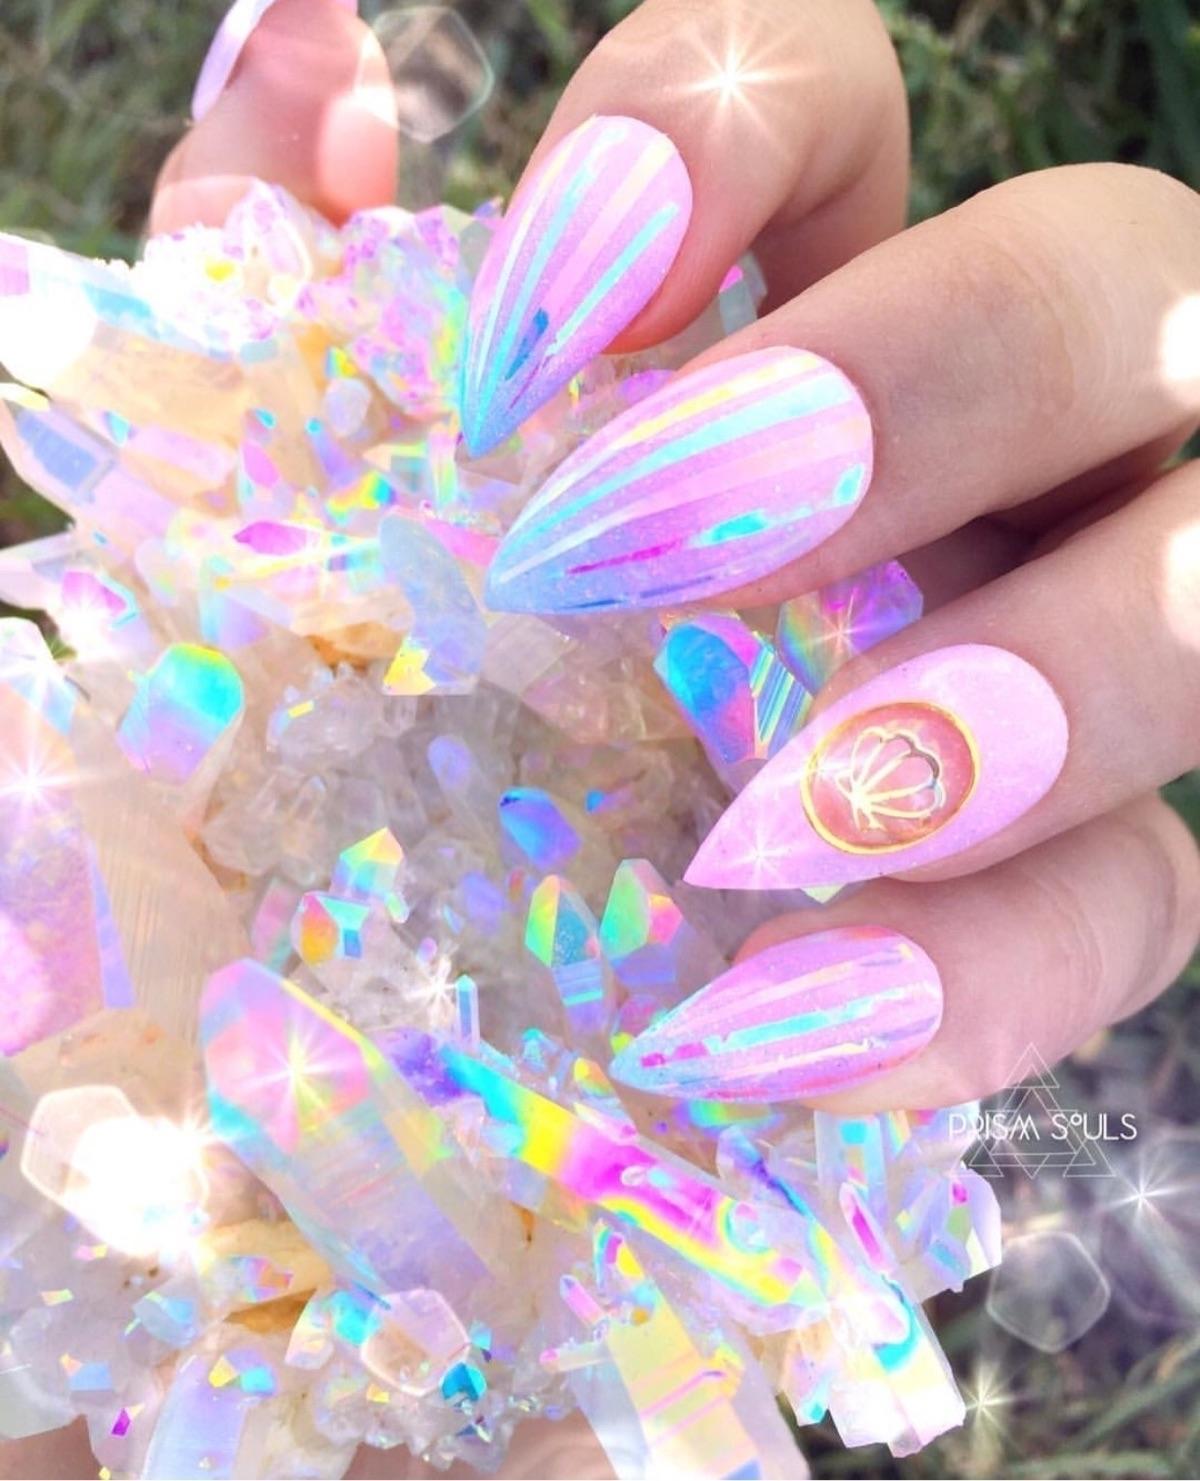 angelaura, rainbowaura, opalaura - prismsouls | ello